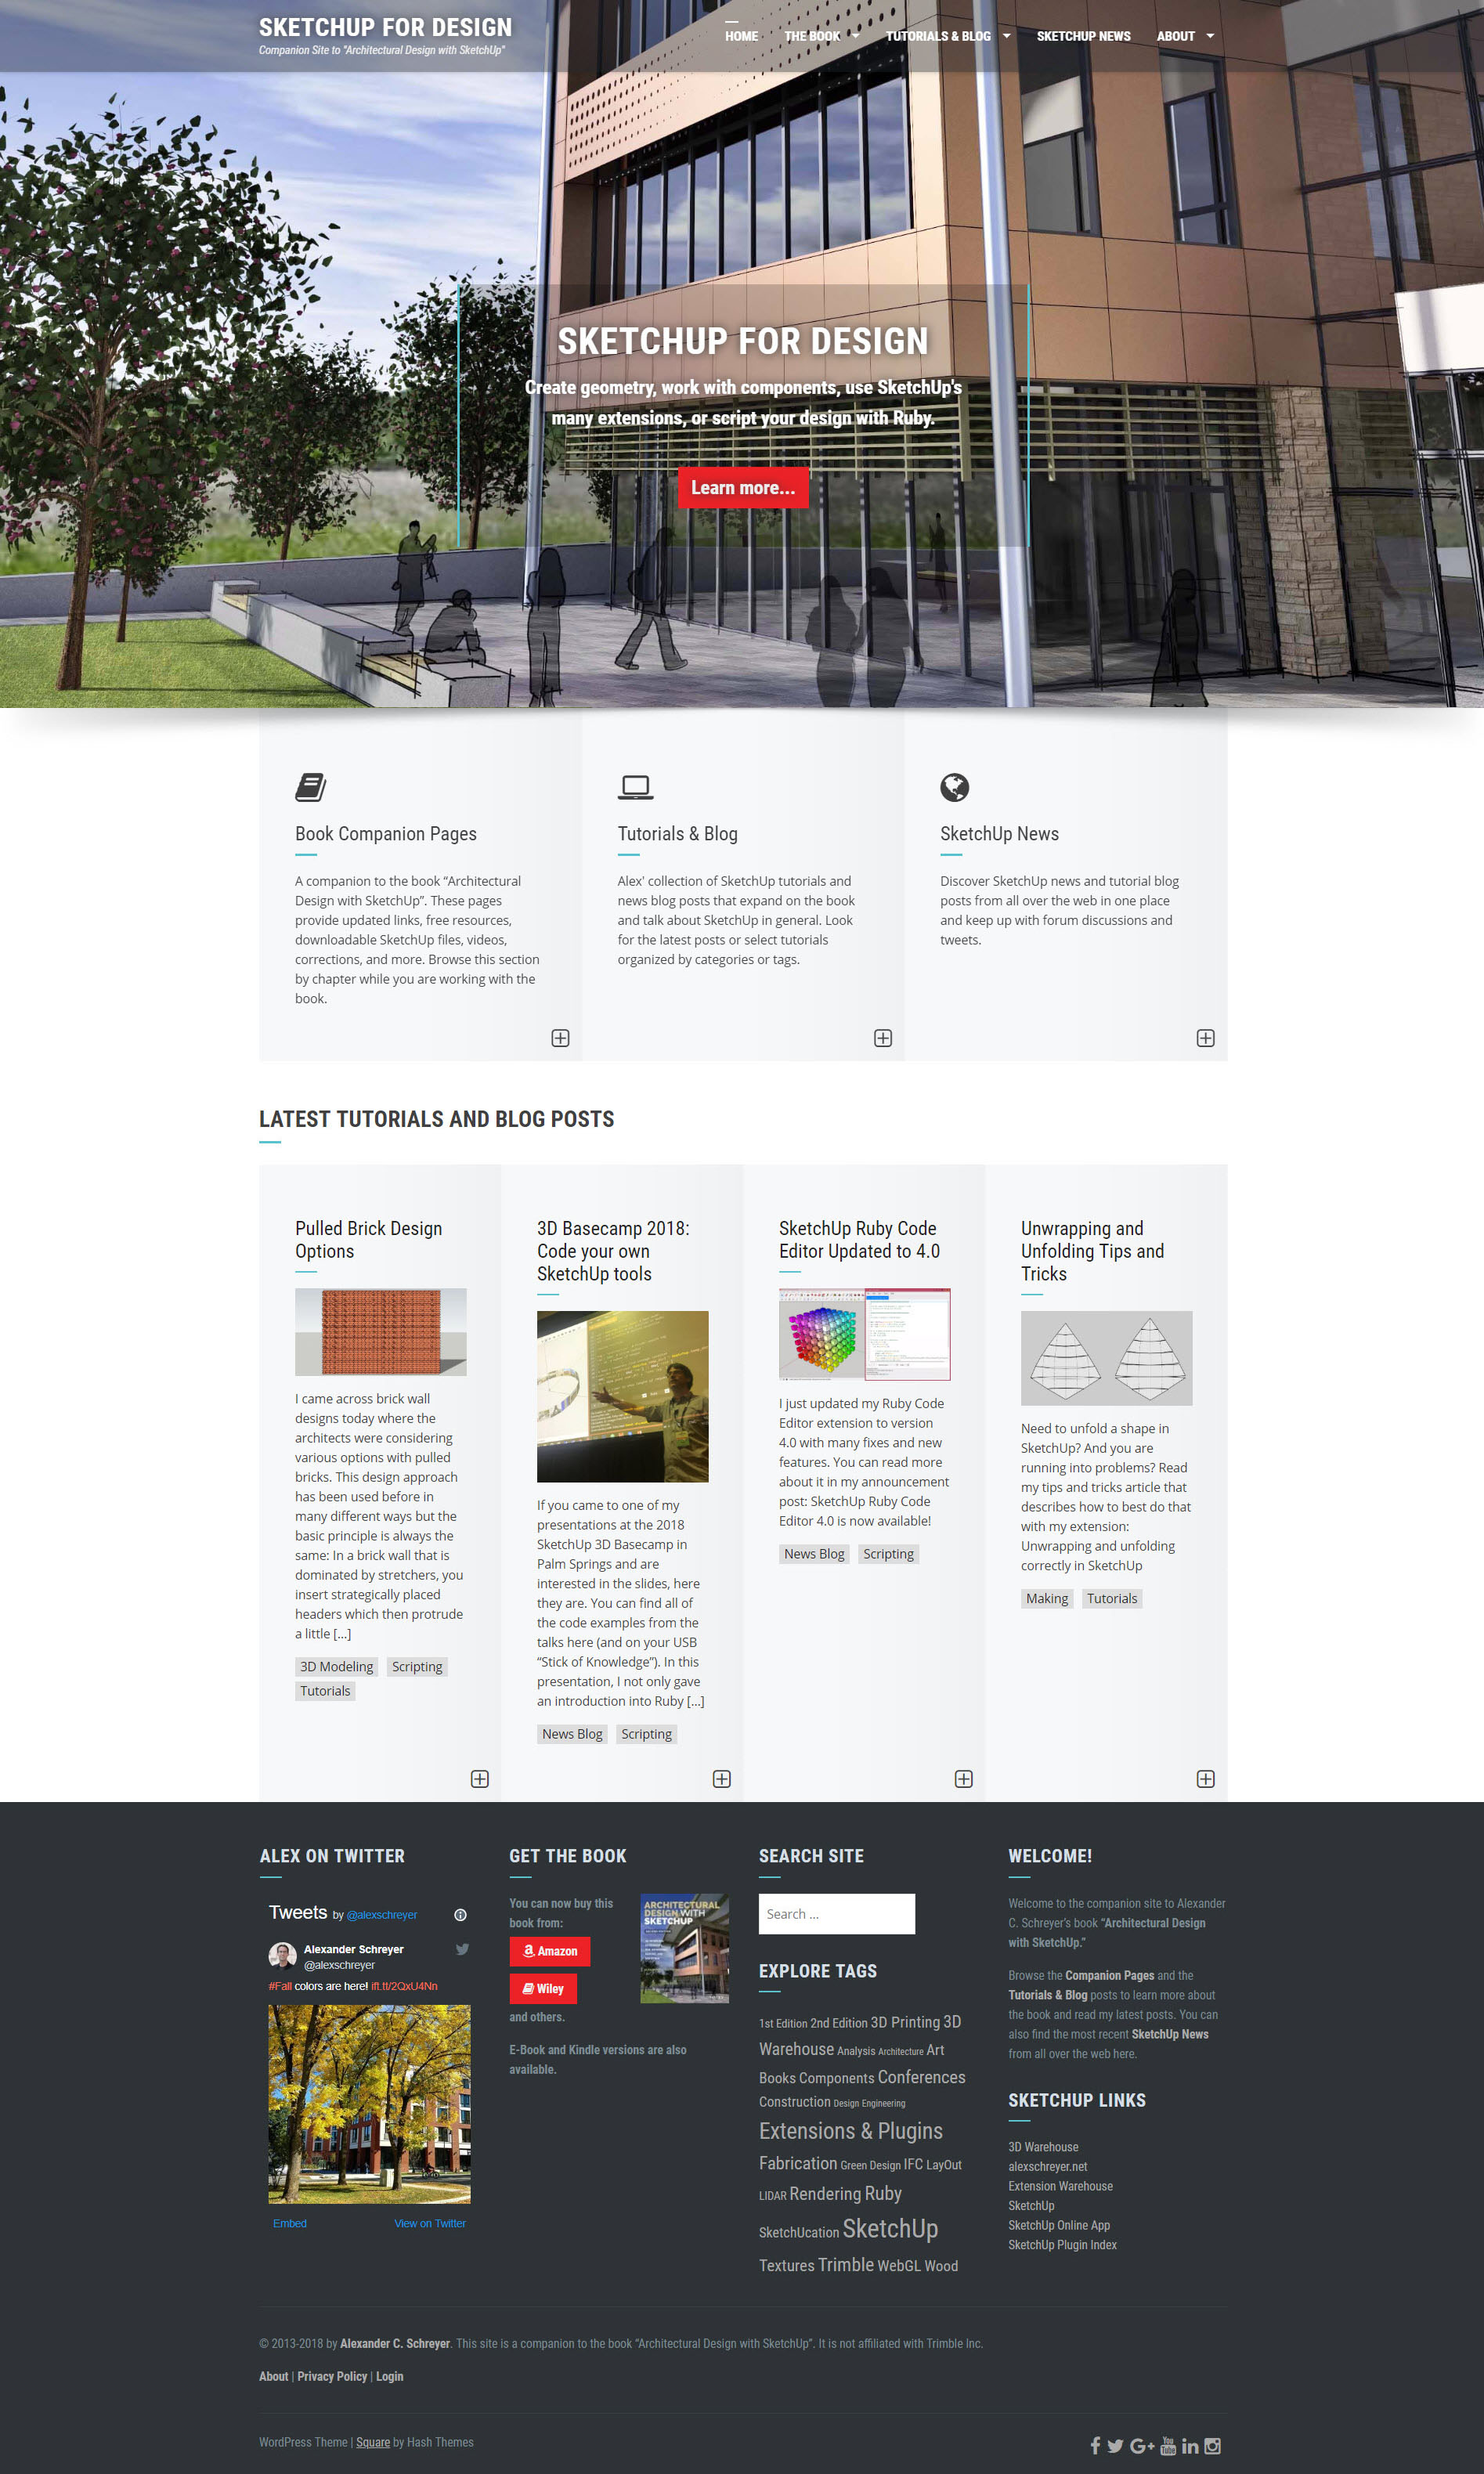 SketchUp for Design - New and Improved! | SketchUp for Design